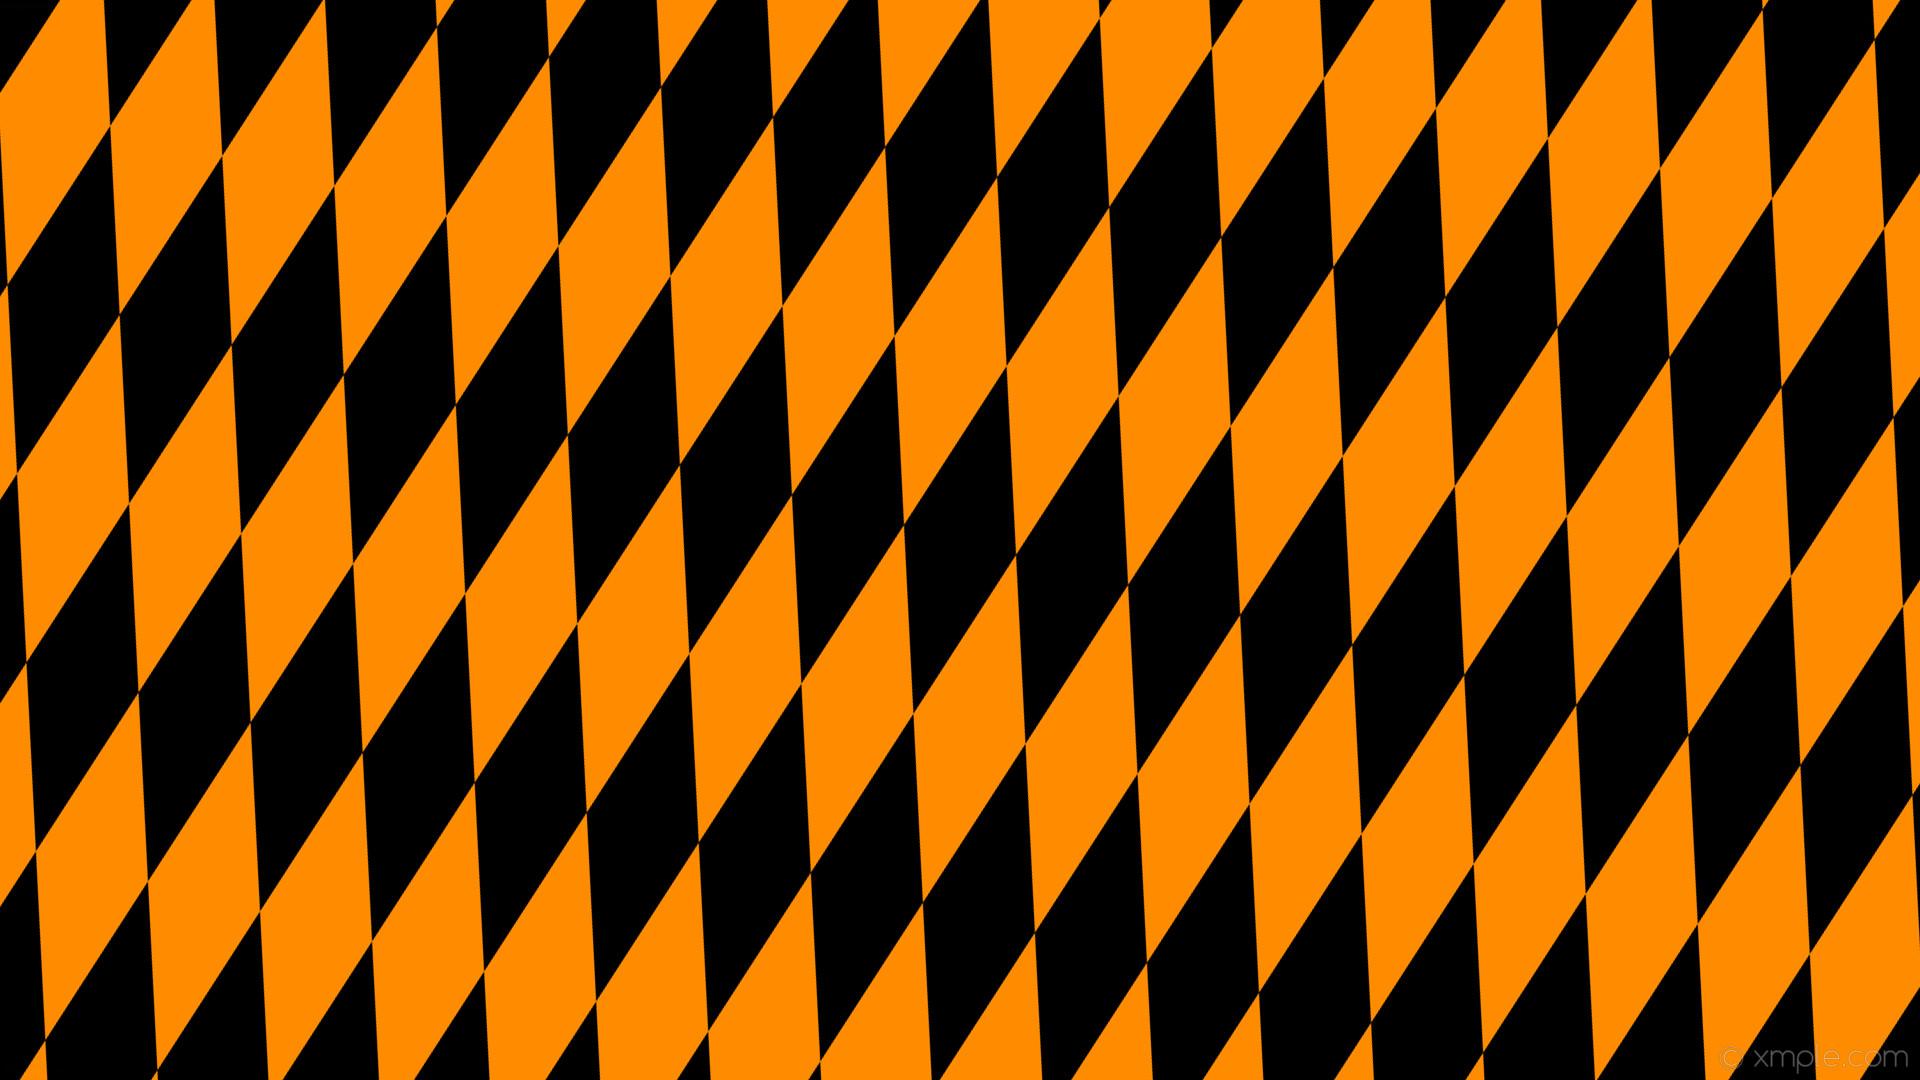 wallpaper orange black rhombus diamond lozenge dark orange #000000 #ff8c00  75° 360px 116px